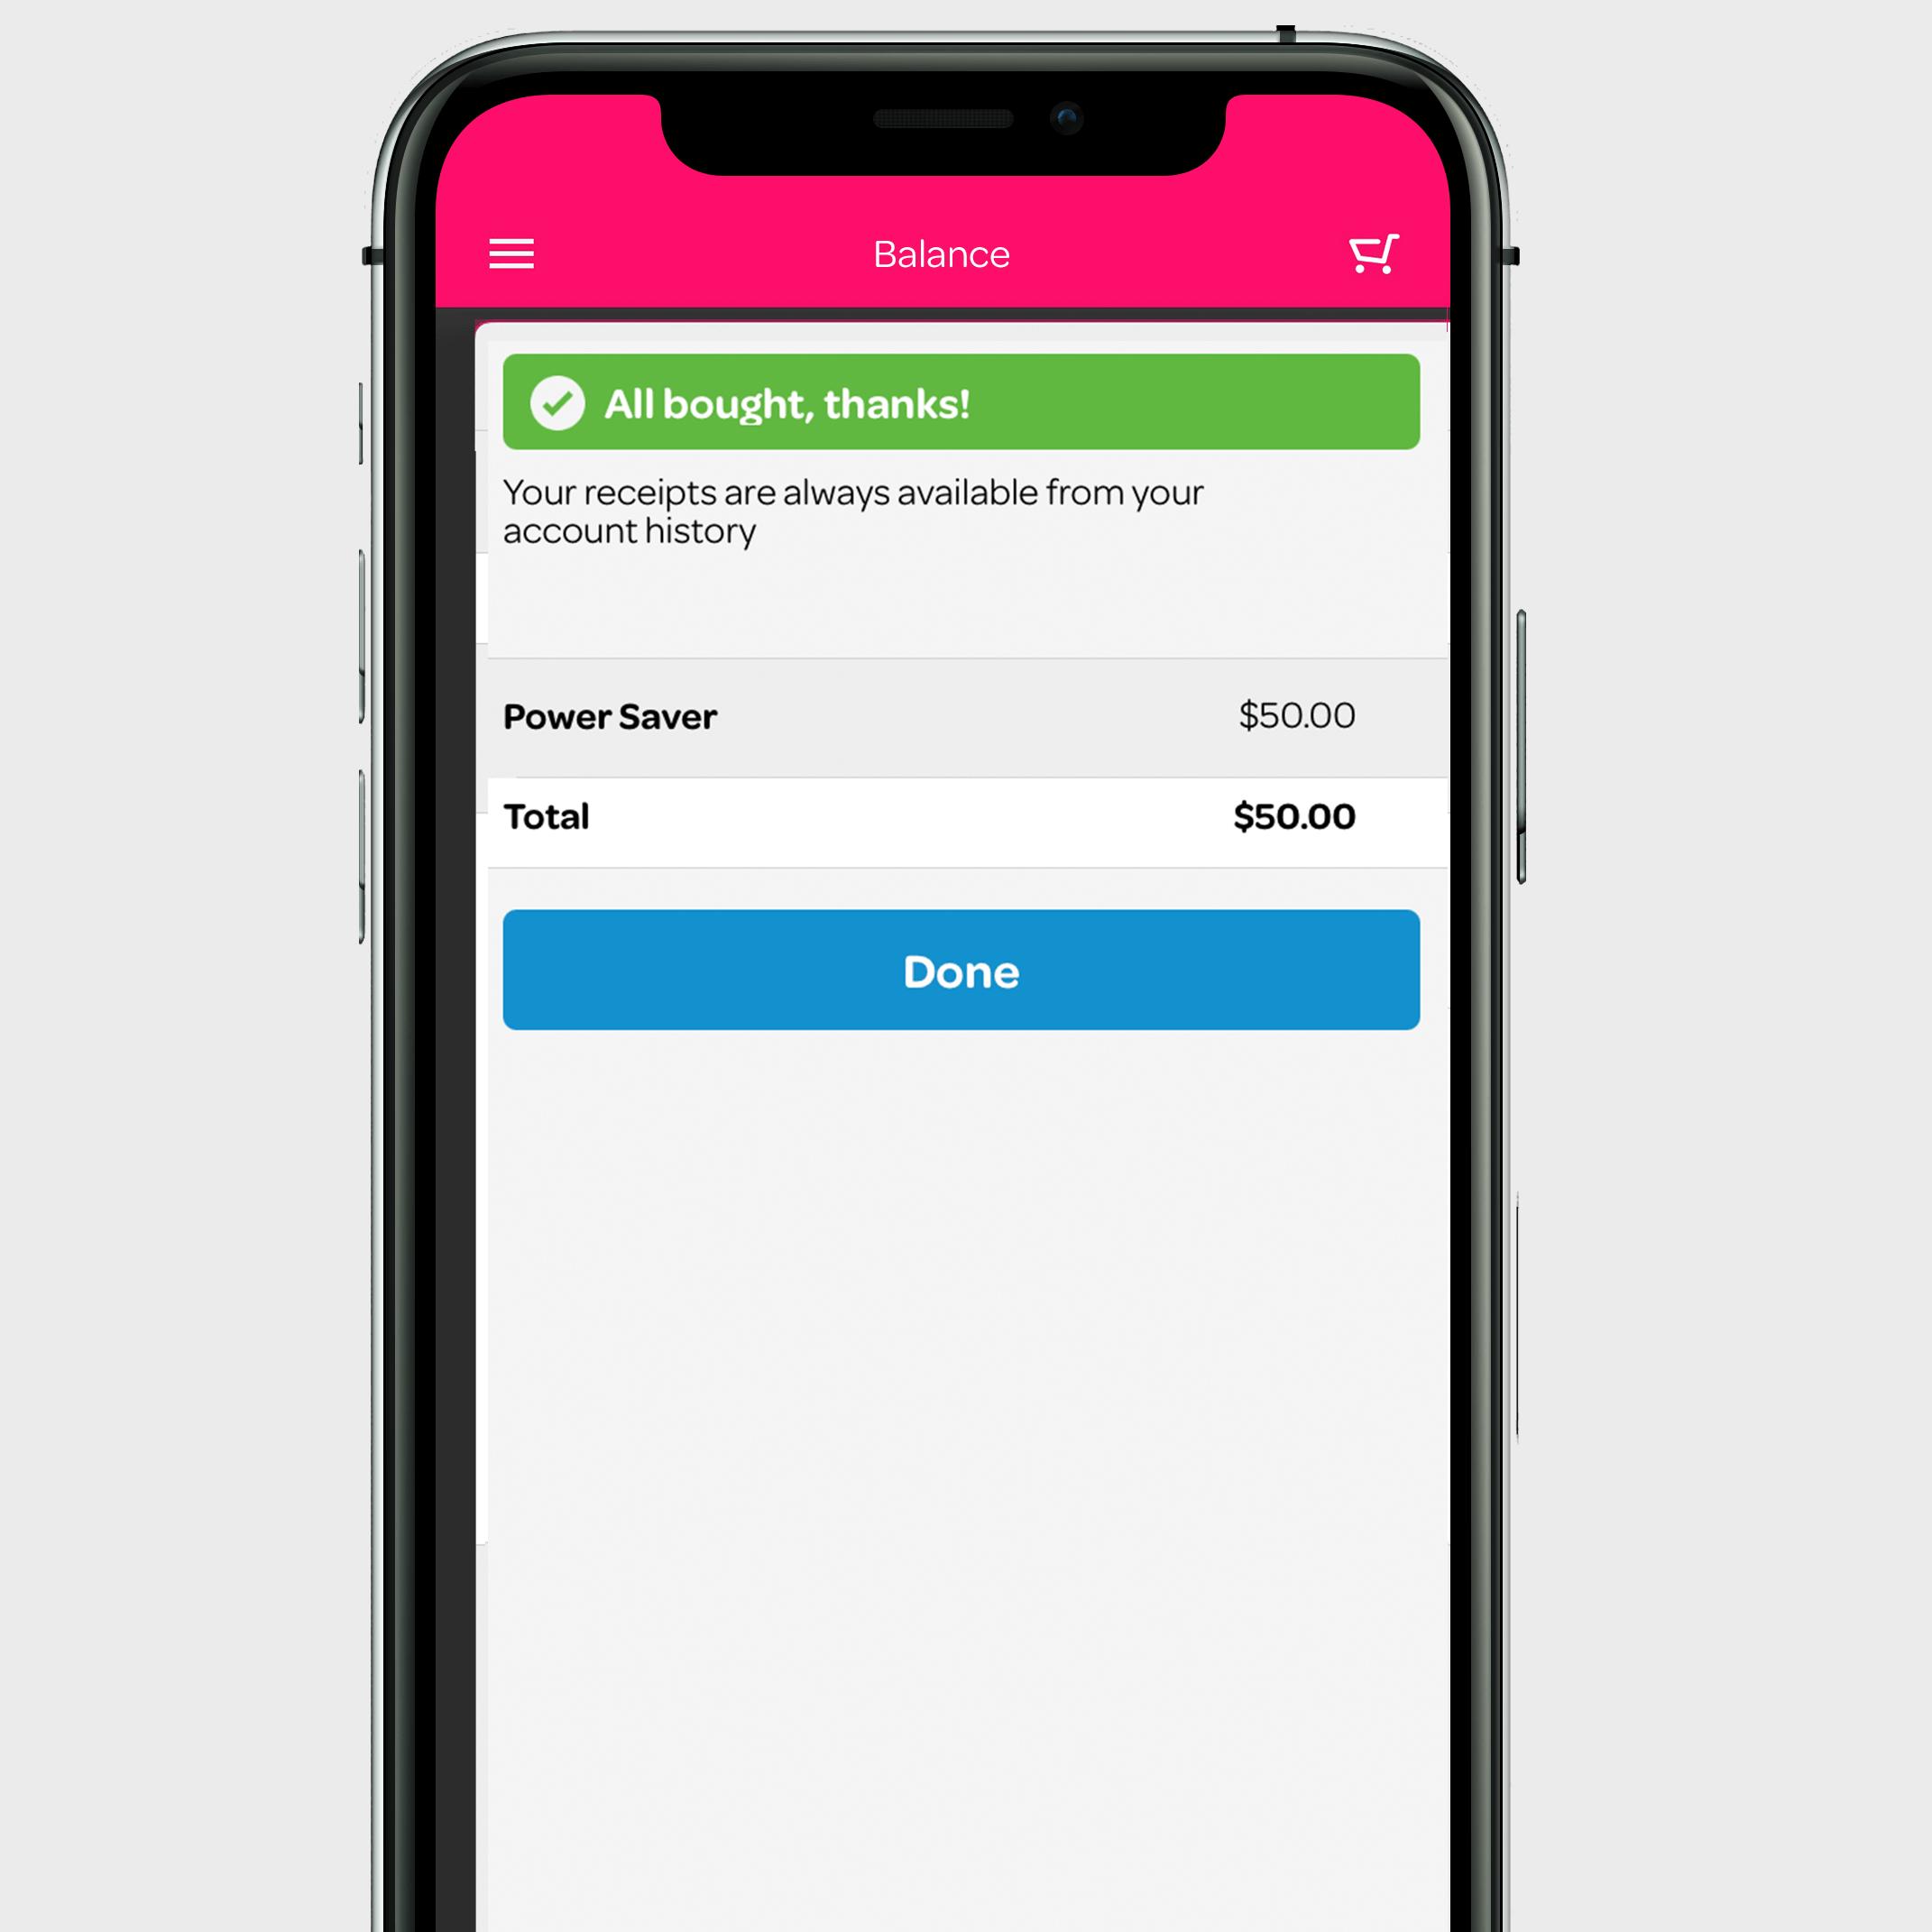 image of the Powershop app